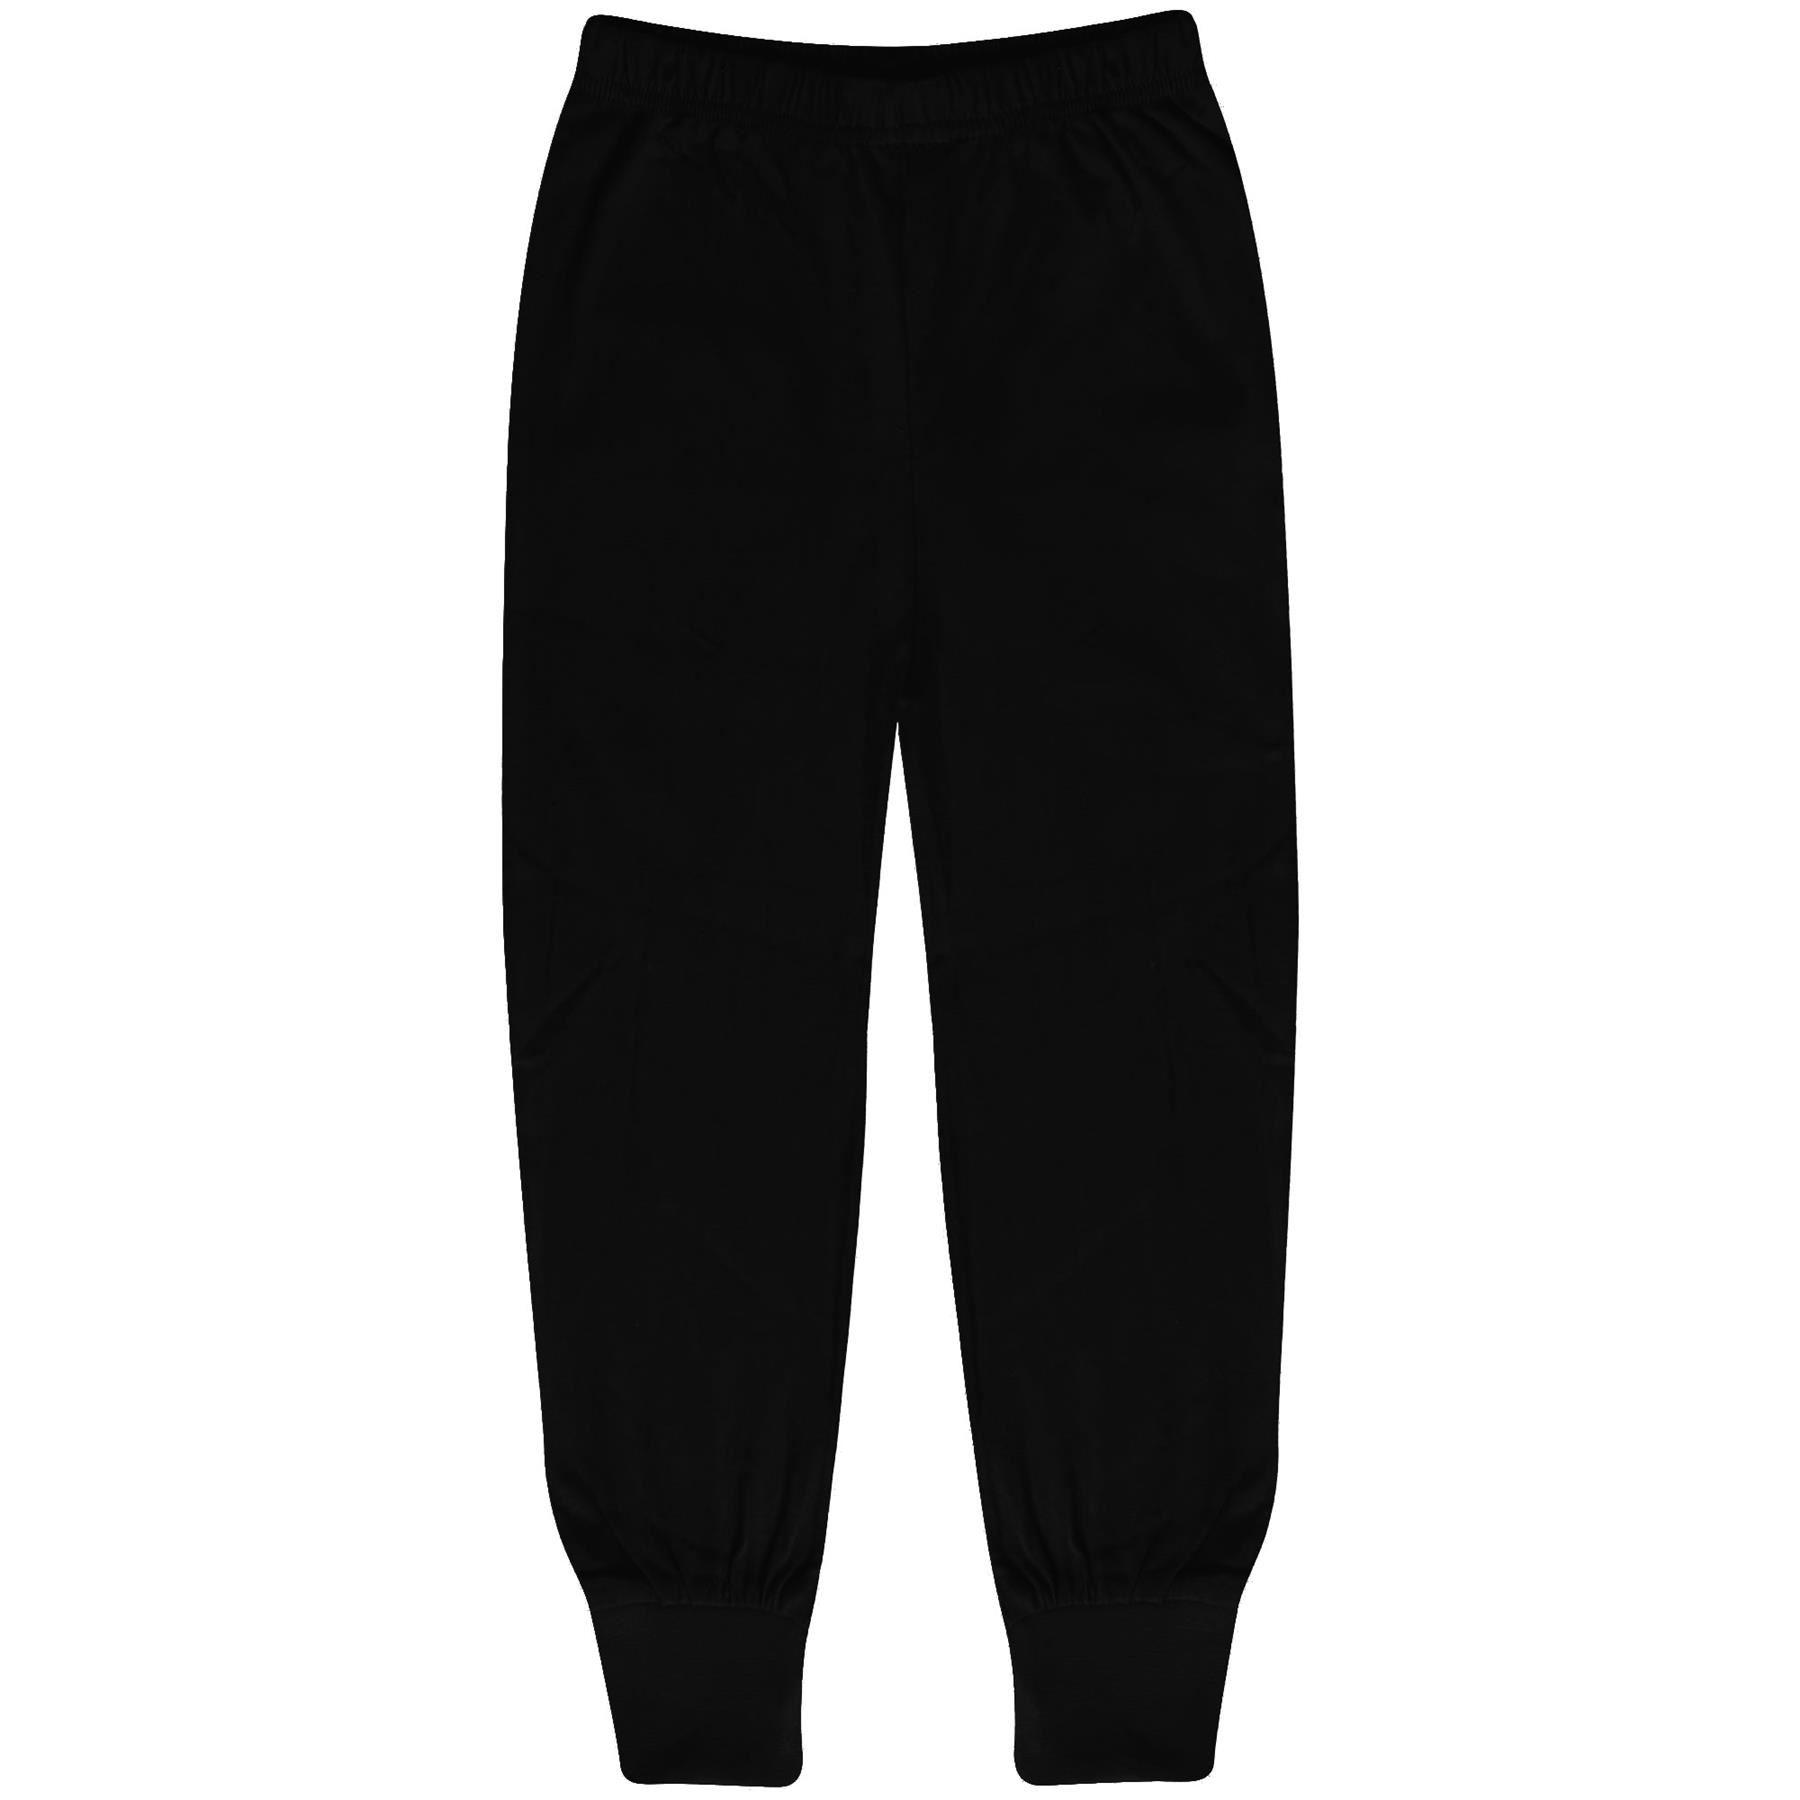 Kids Boys Girls Pyjamas Black Trendy Floss A2Z Print Christmas Loungewear Outfit